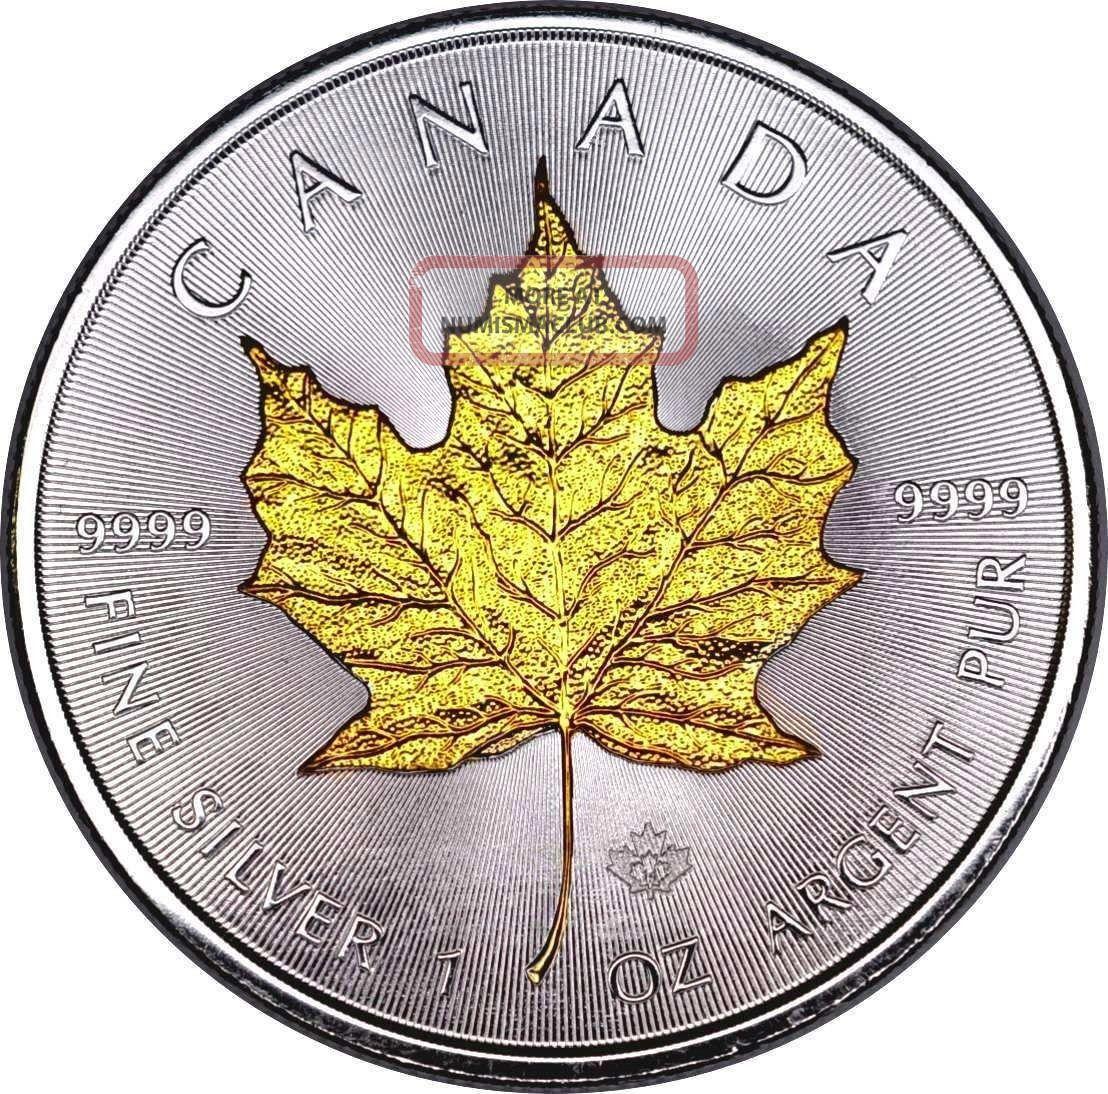 canadian maple leaf silver coins - HD1108×1094